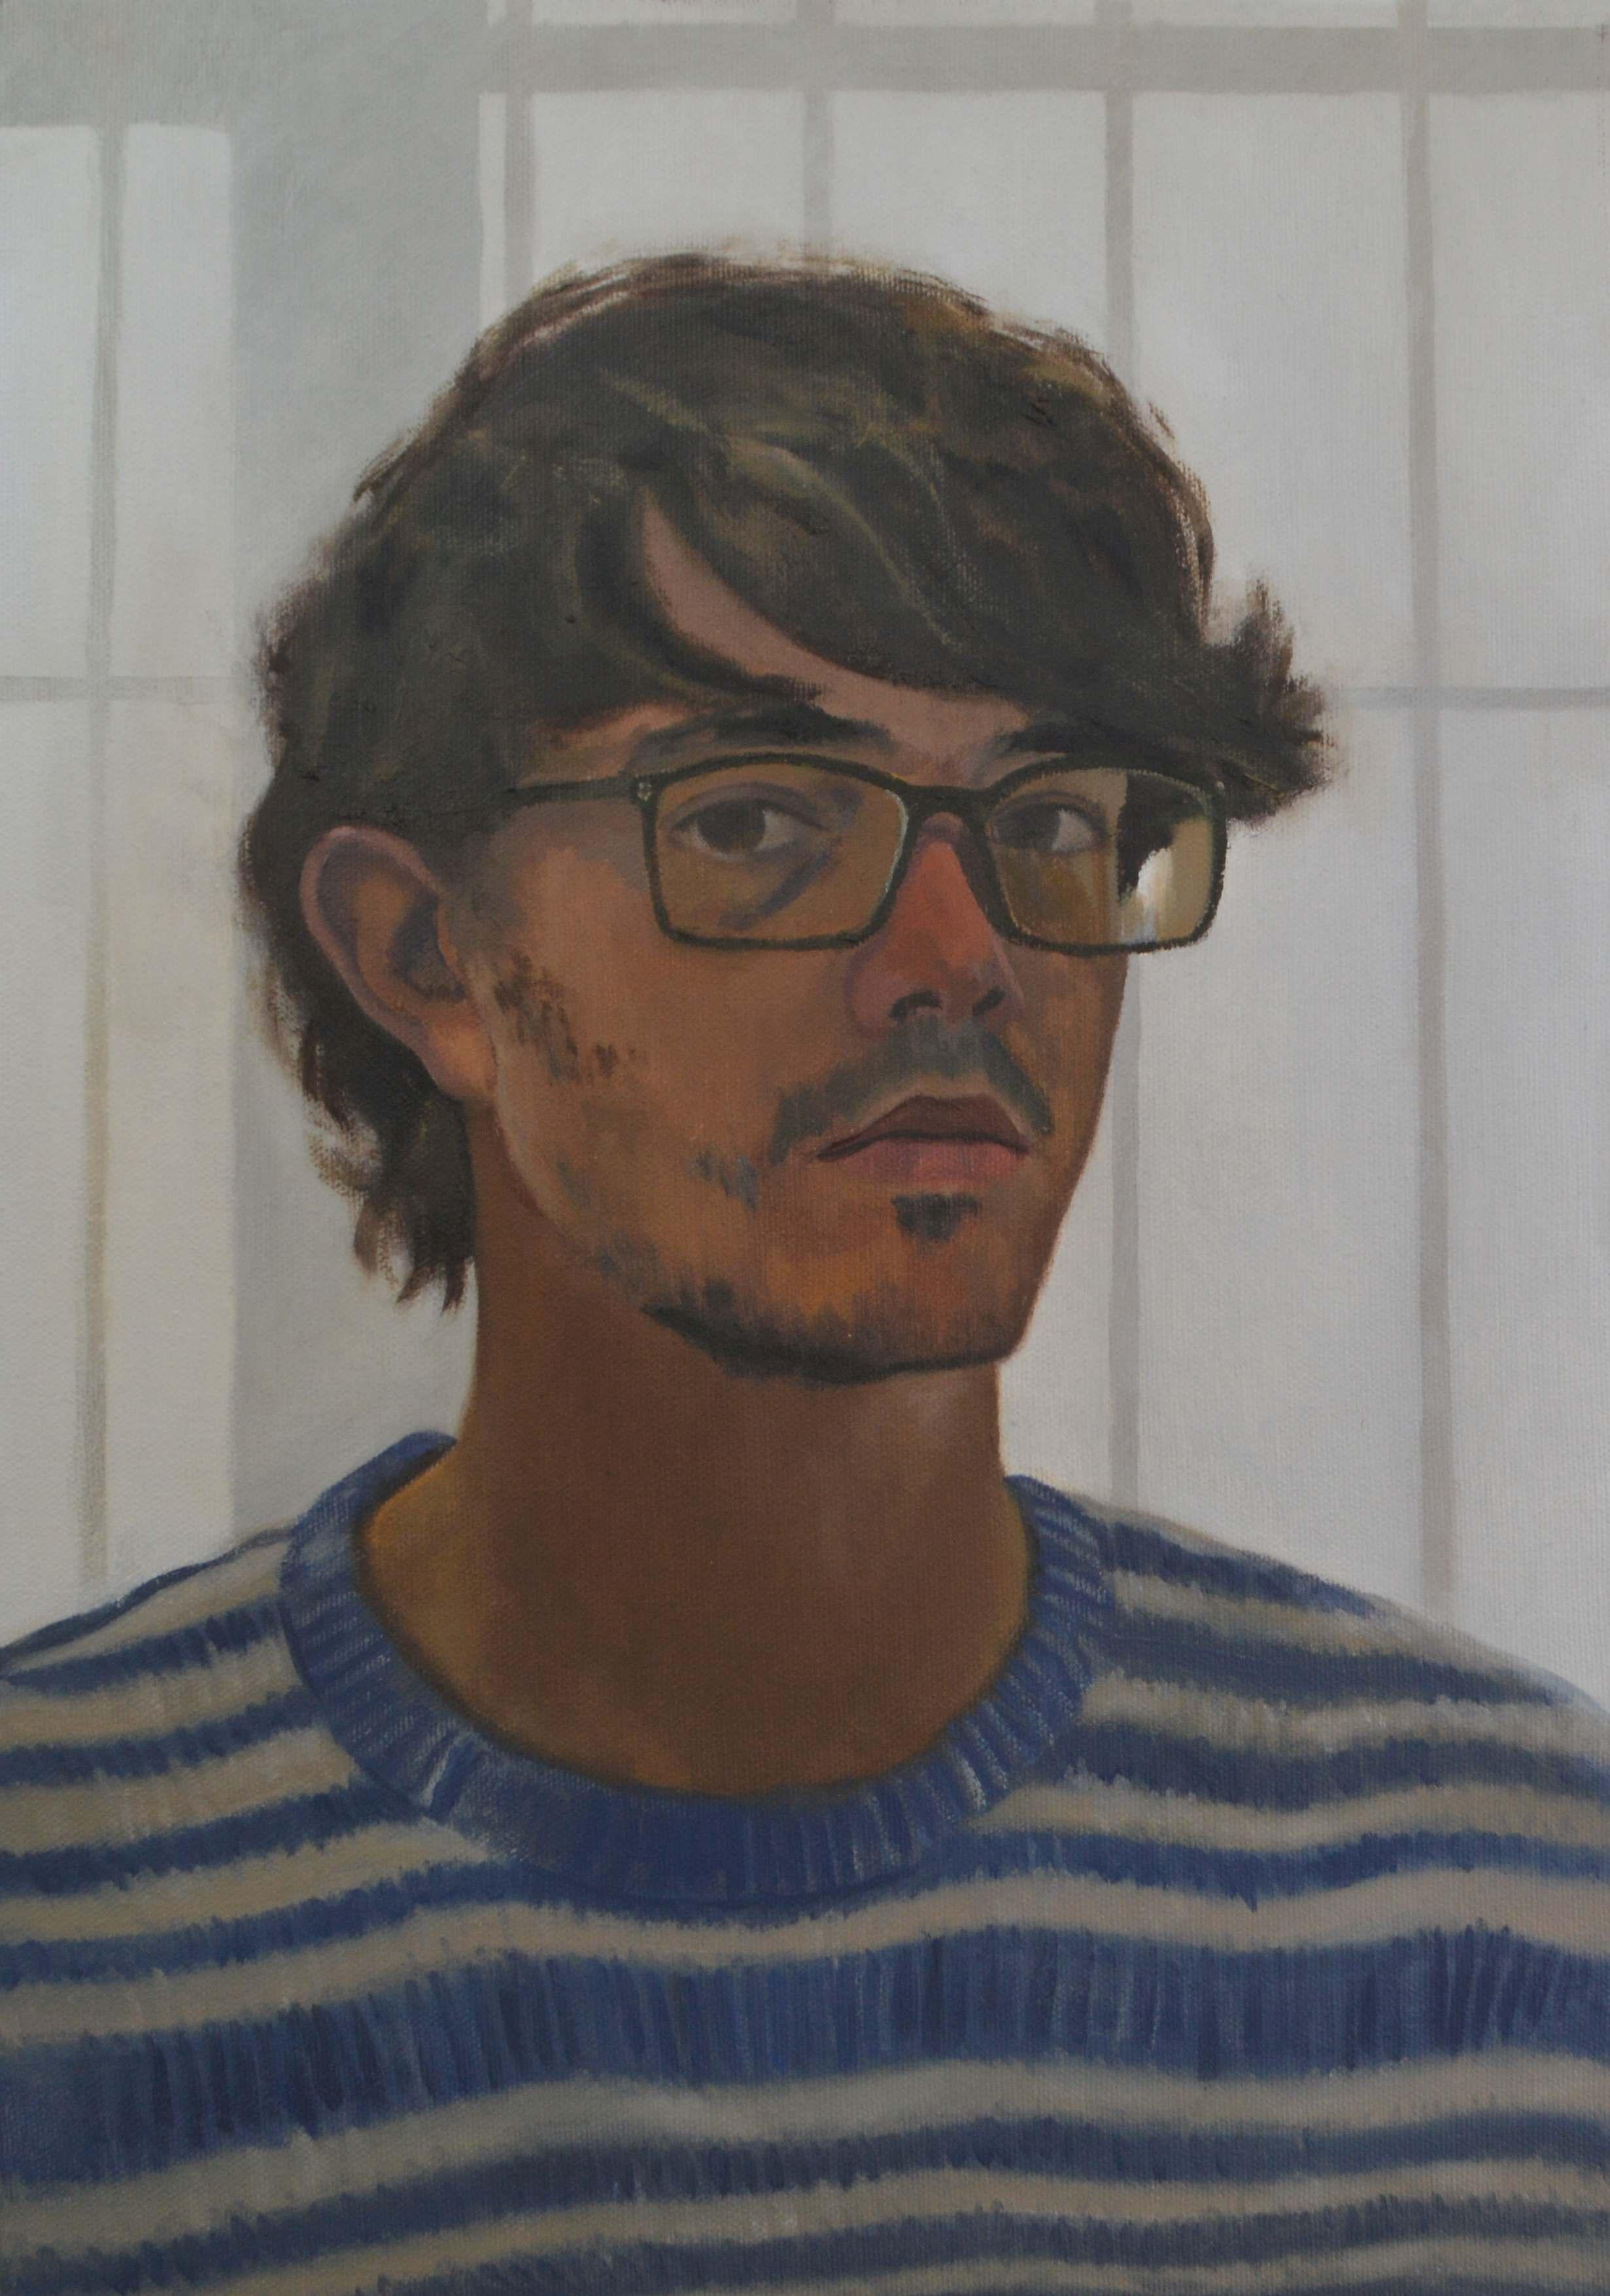 Self portrait in studio